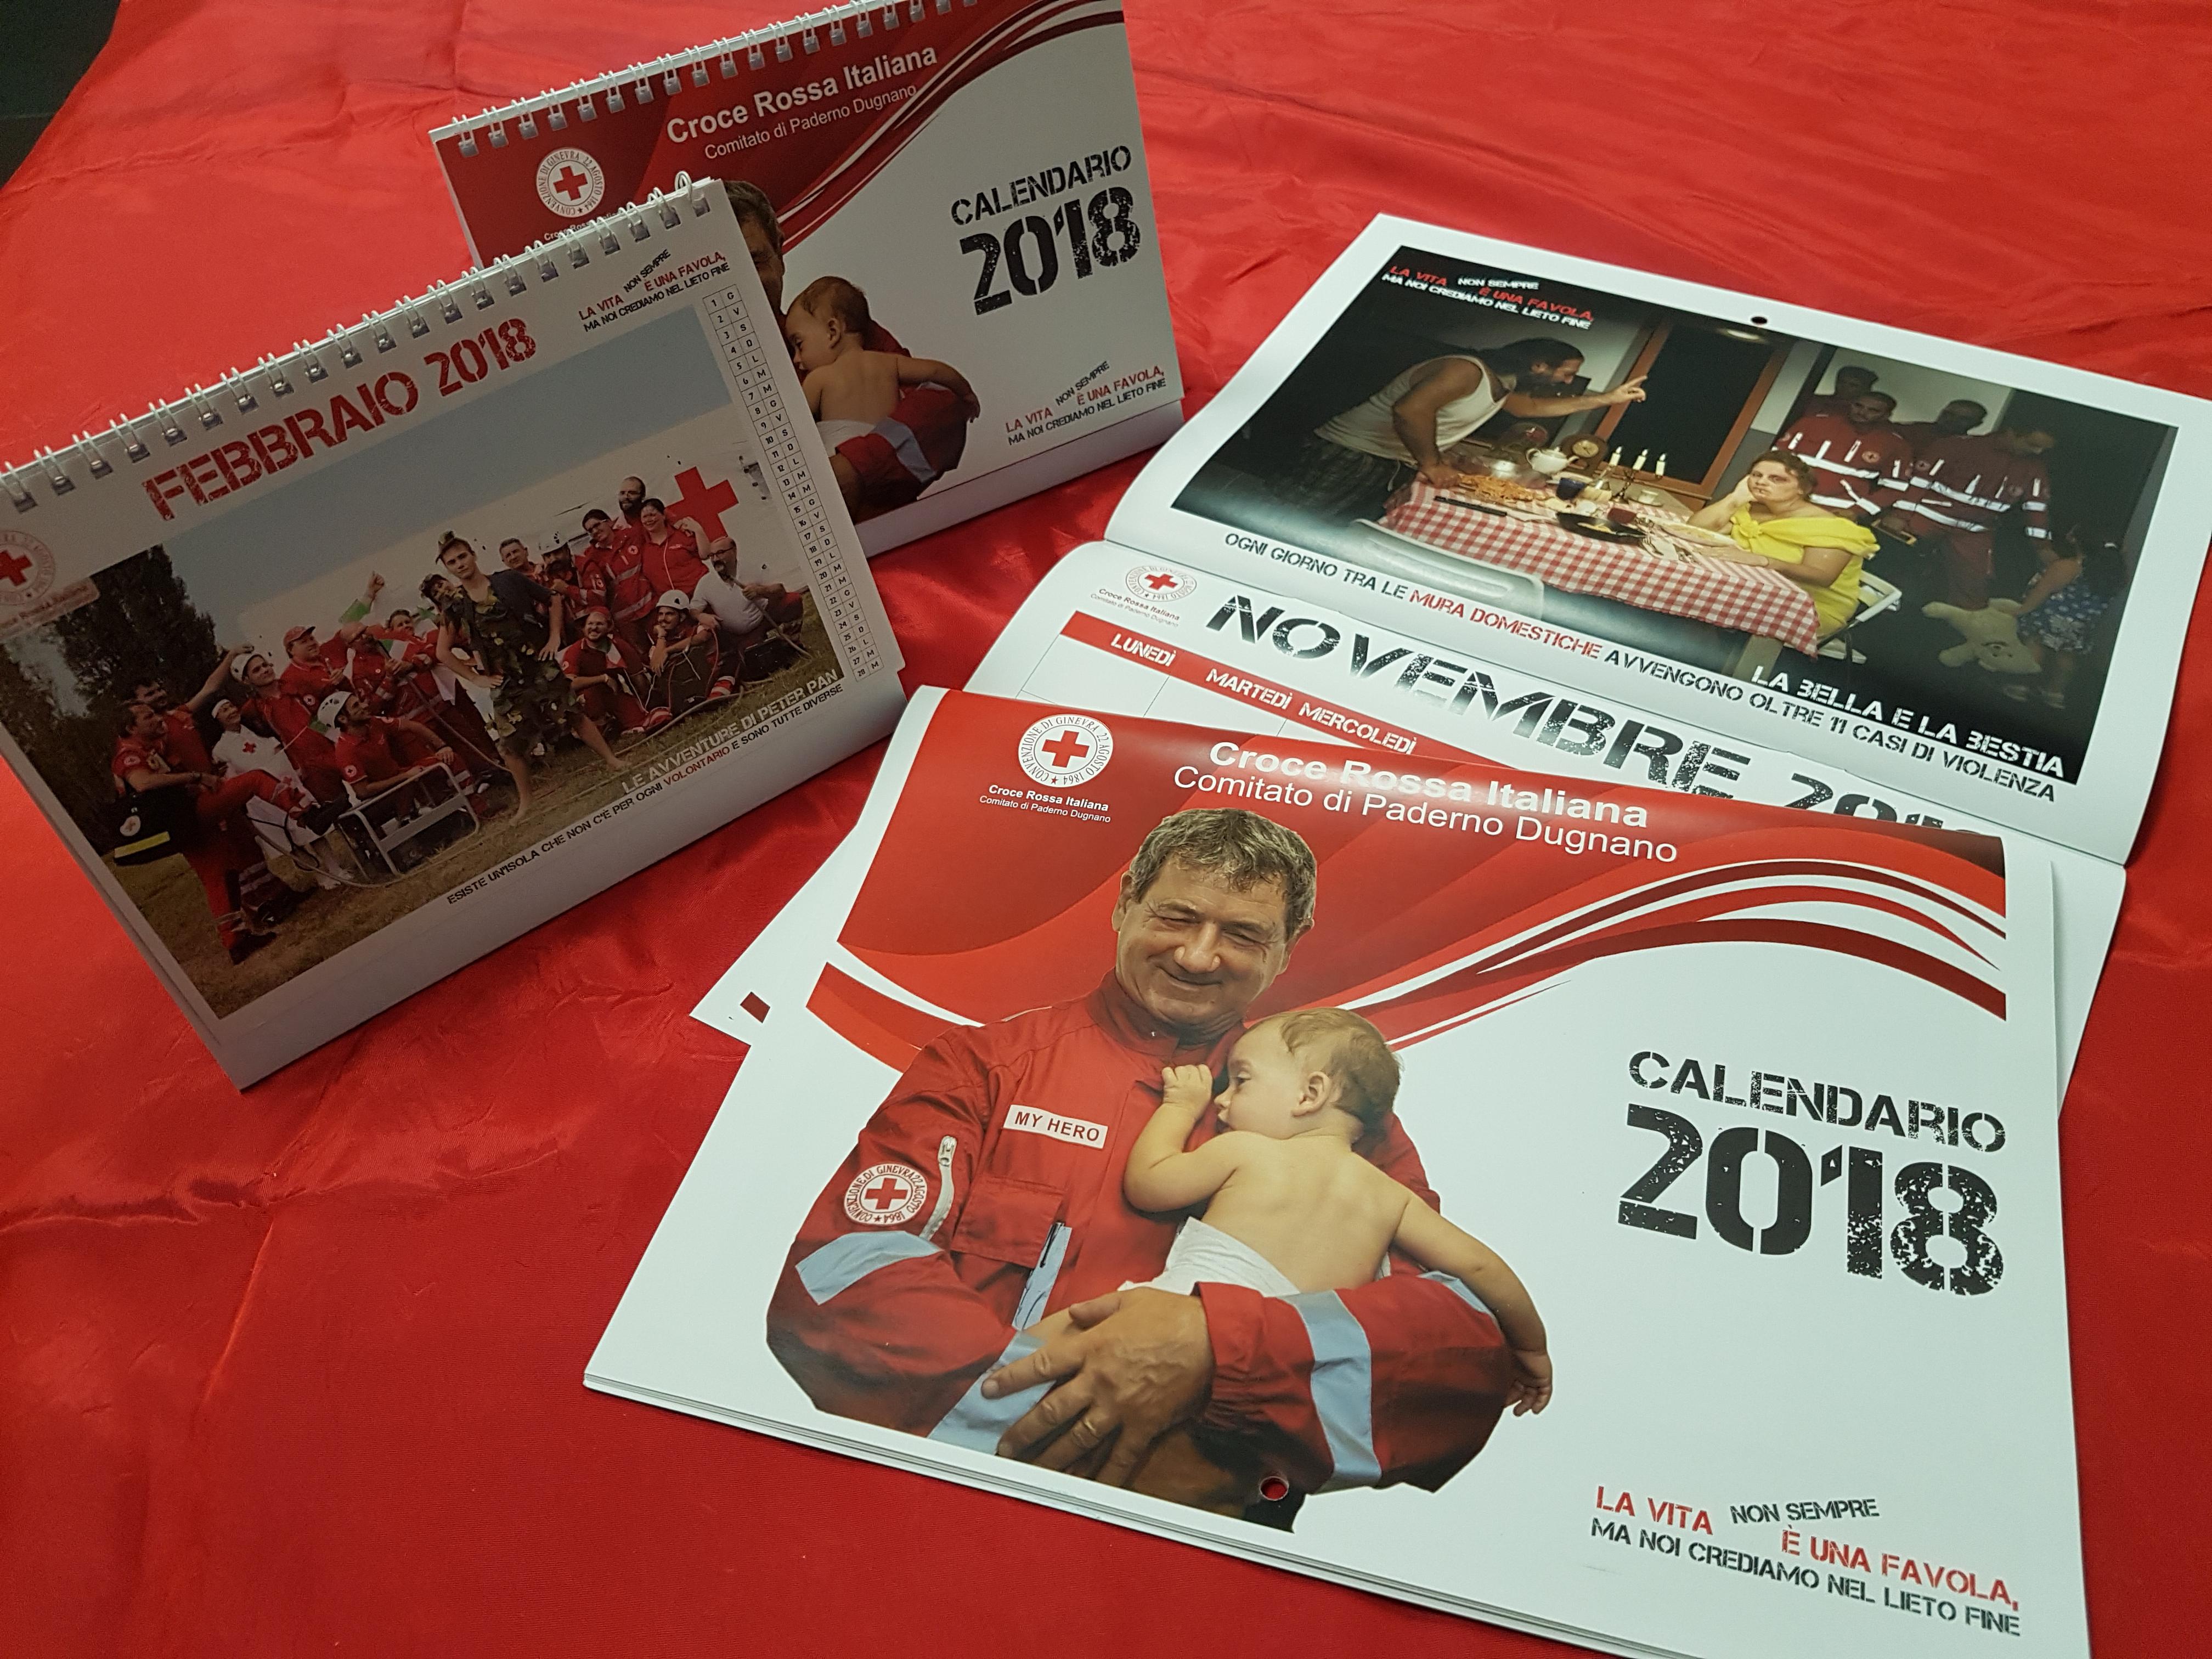 Calendario CRI Paderno Dugnano 2018